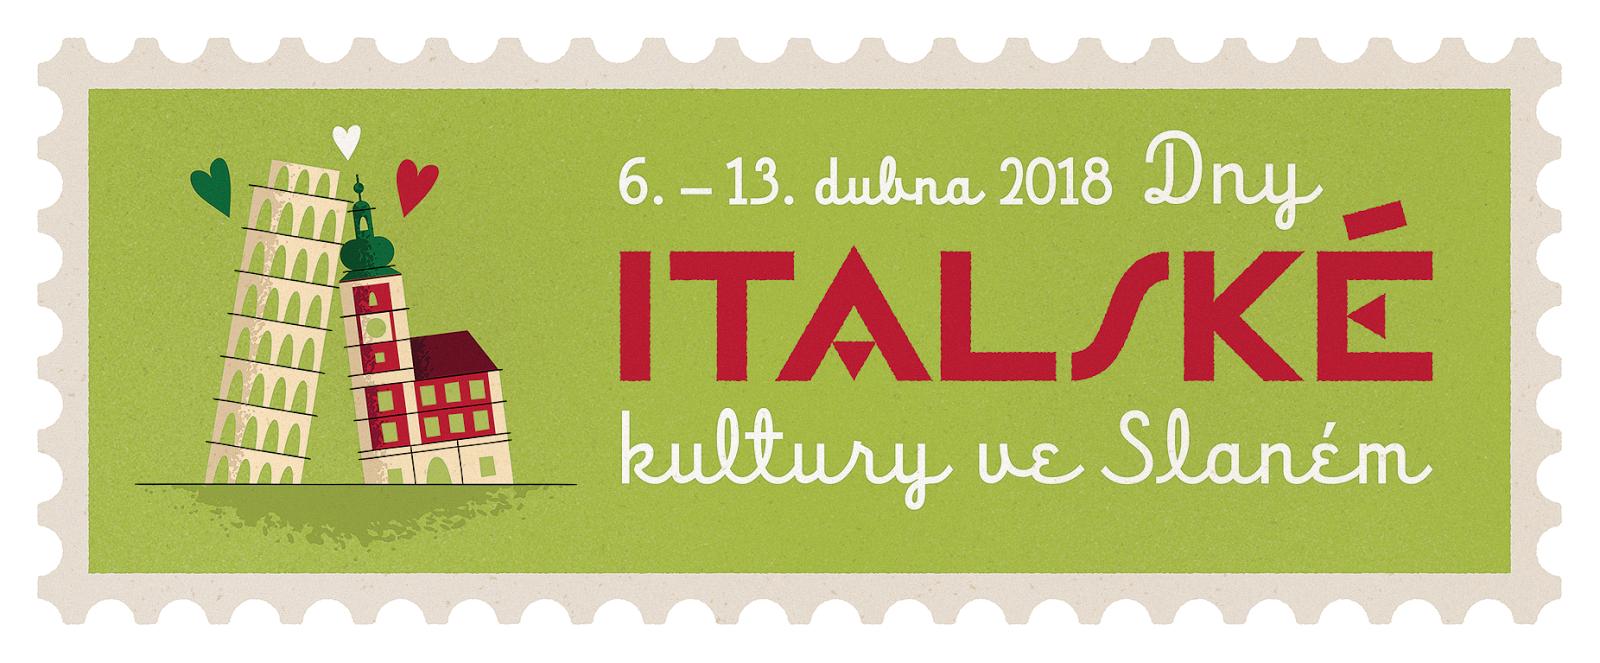 Dny italské kultury